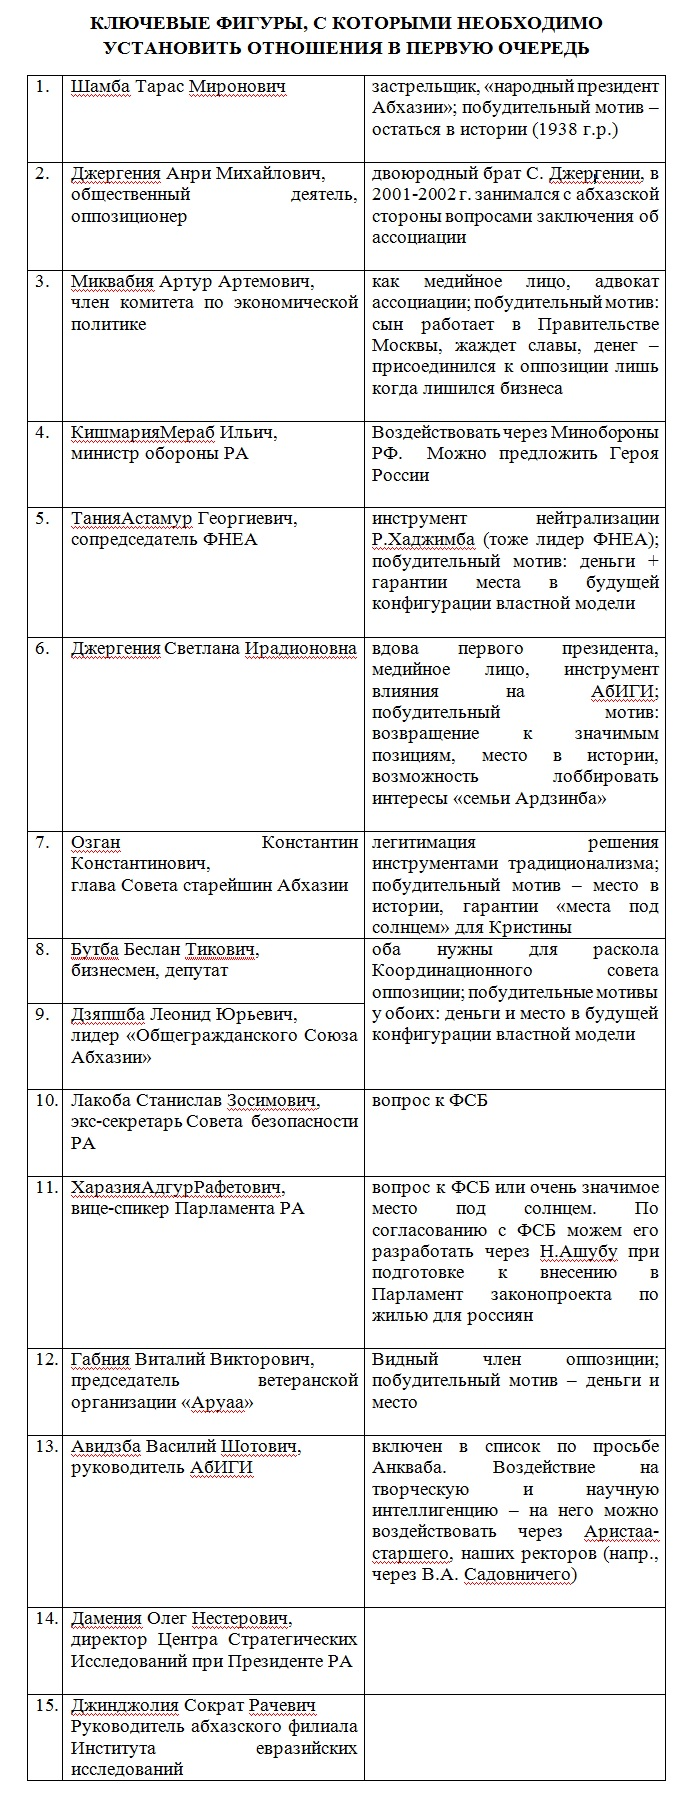 abkhazia_surkov